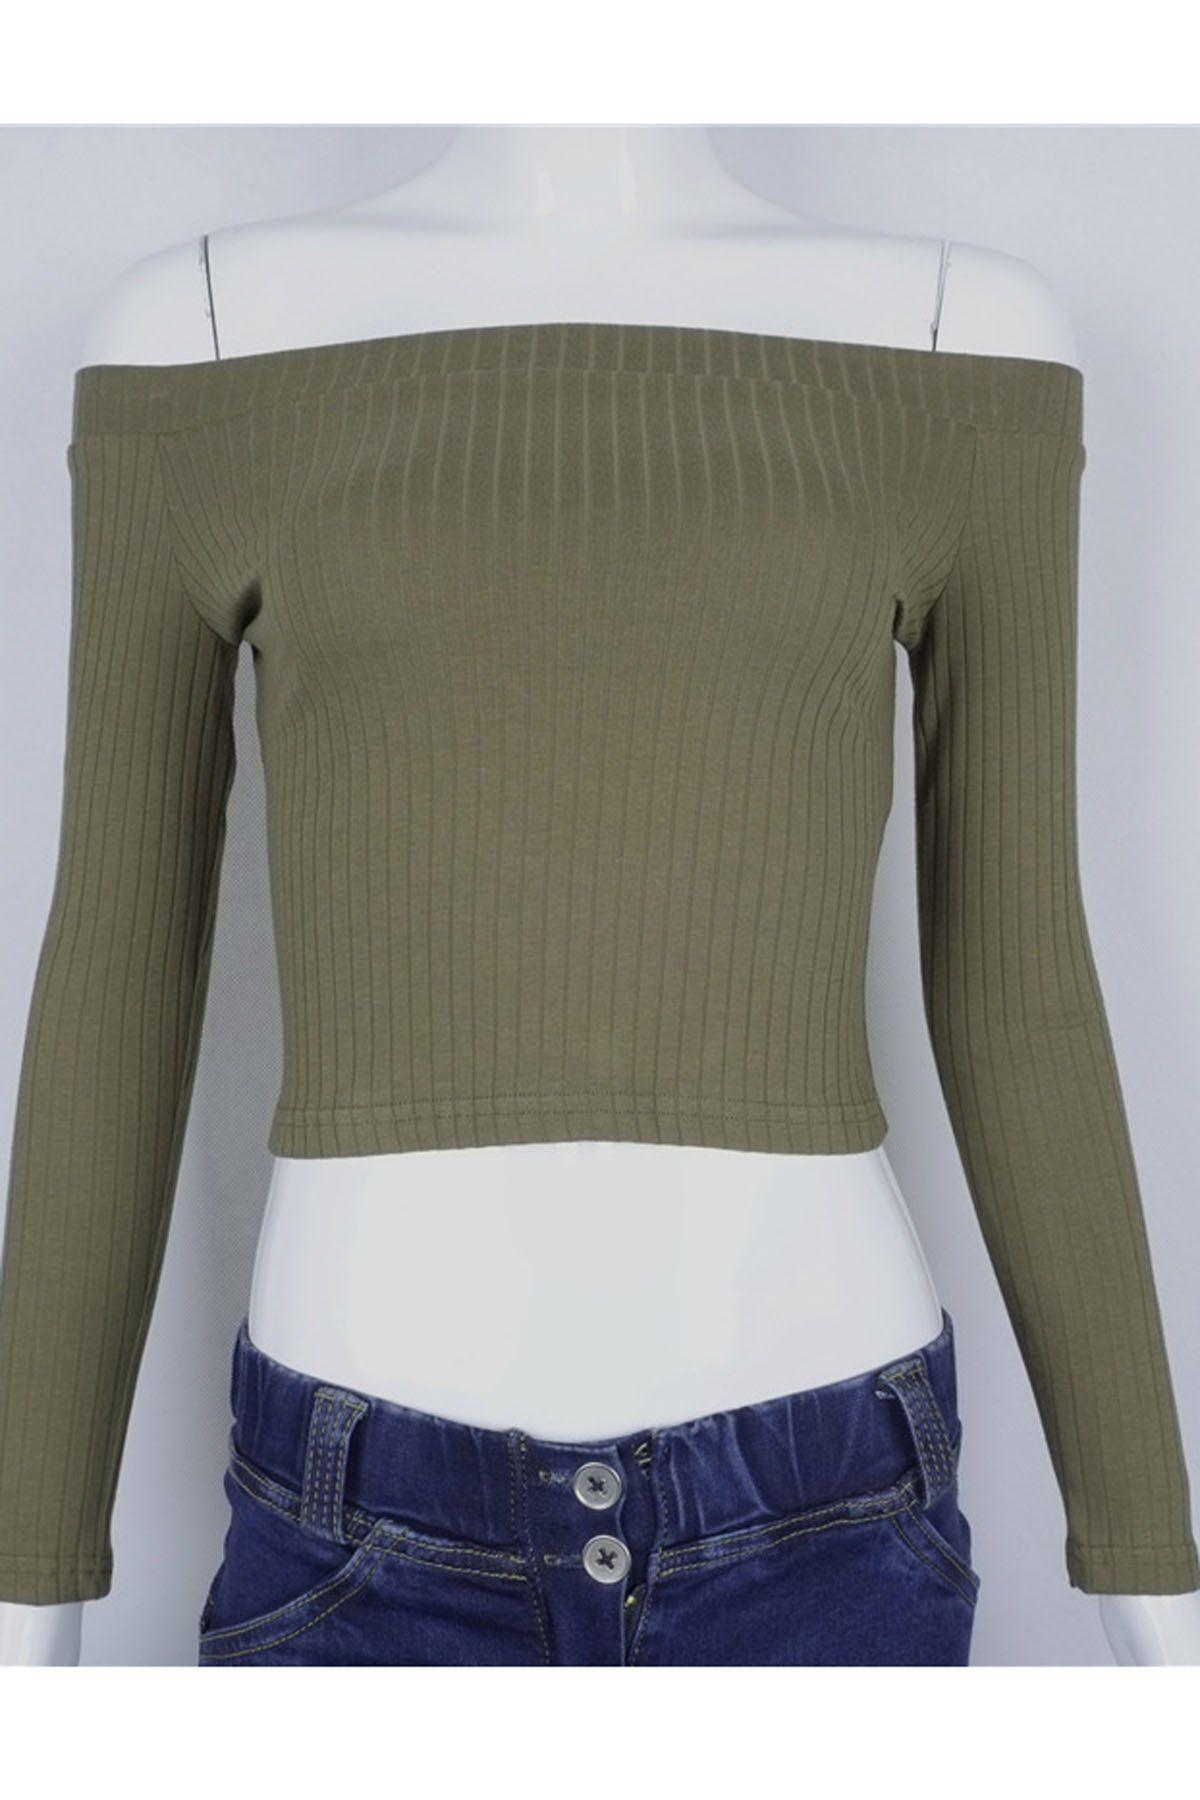 bae4b8b6 Long Sleeves Off Shoulder Pure Color Crop Top   Tank Tops & Vests ...